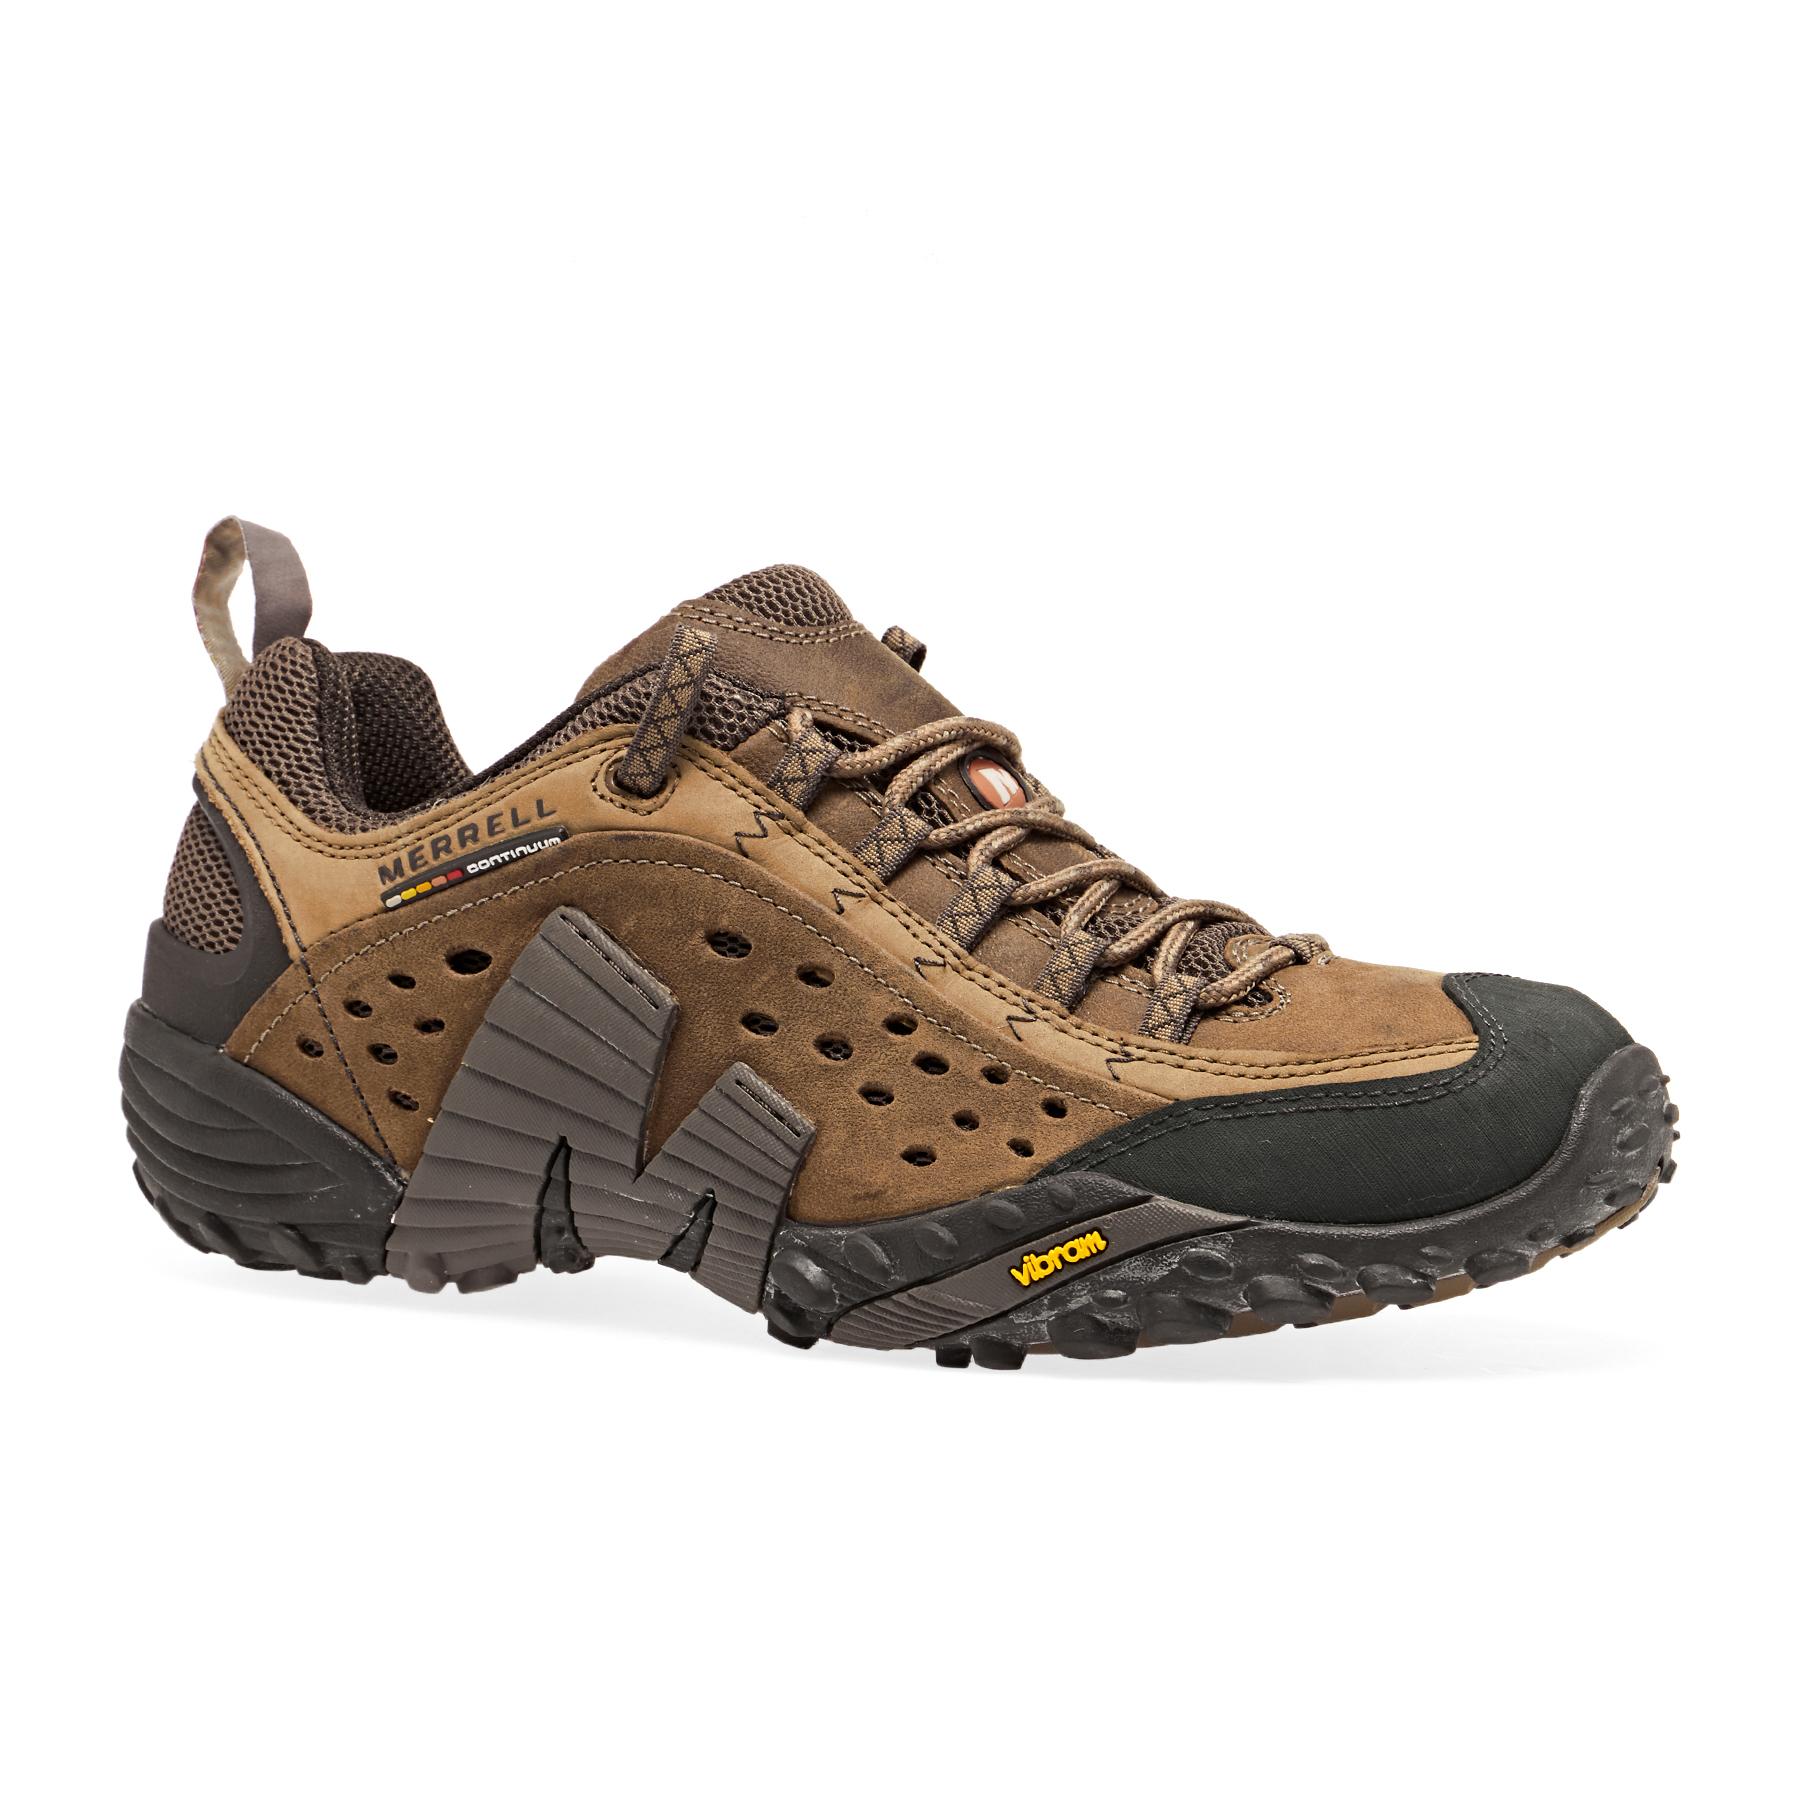 Merrell Intercept Walking Shoes   Free